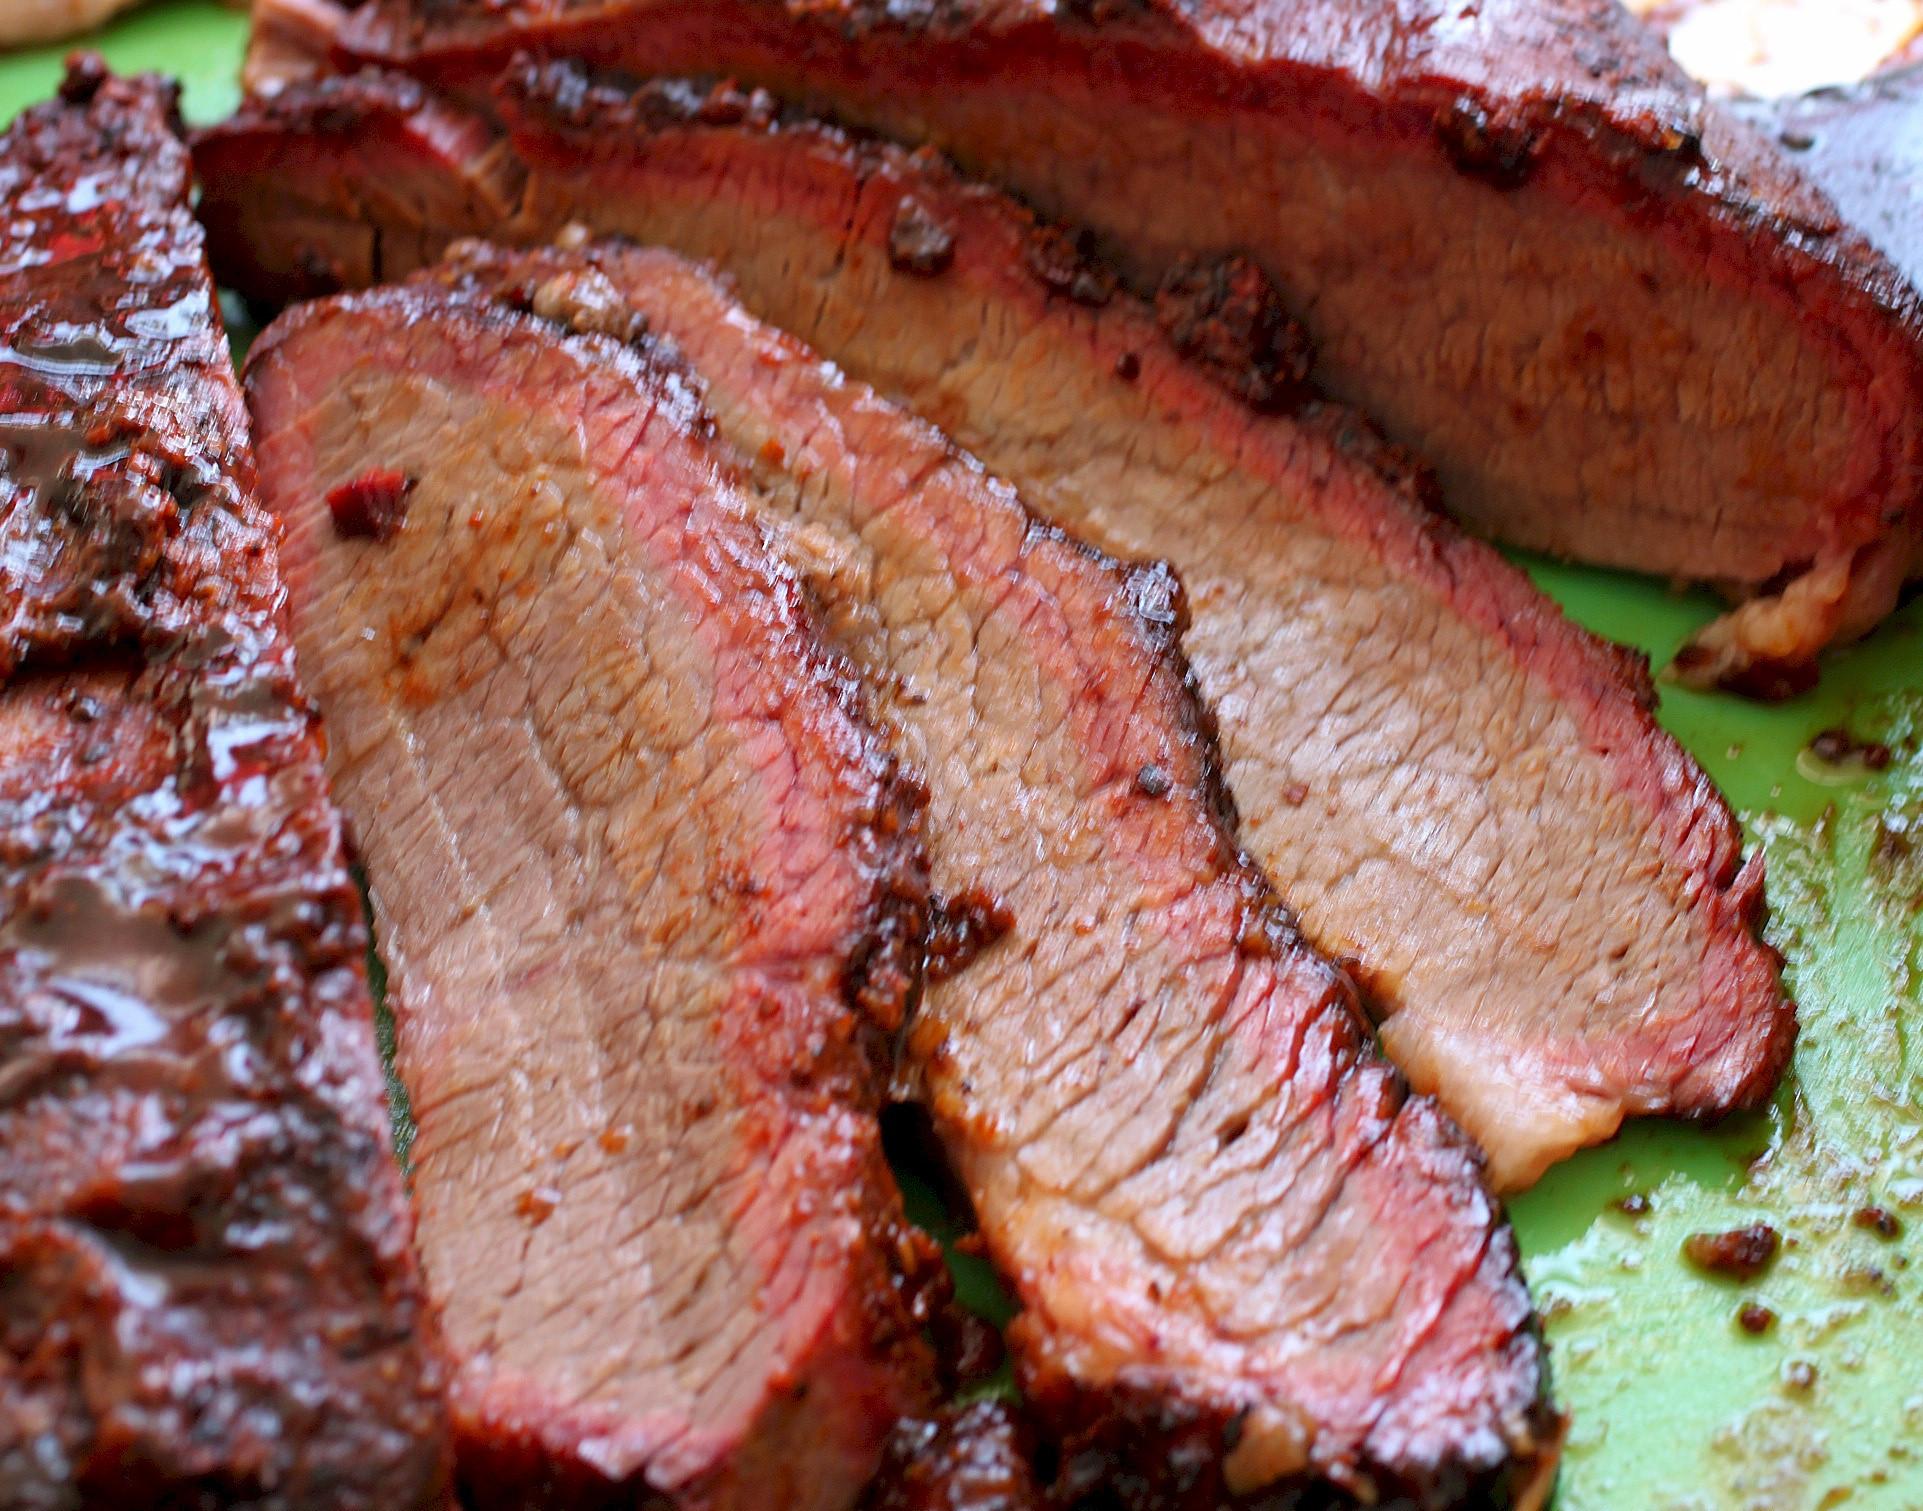 Bbq Beef Brisket Recipe  O'Hara's IPA Braised Brisket O Hara s